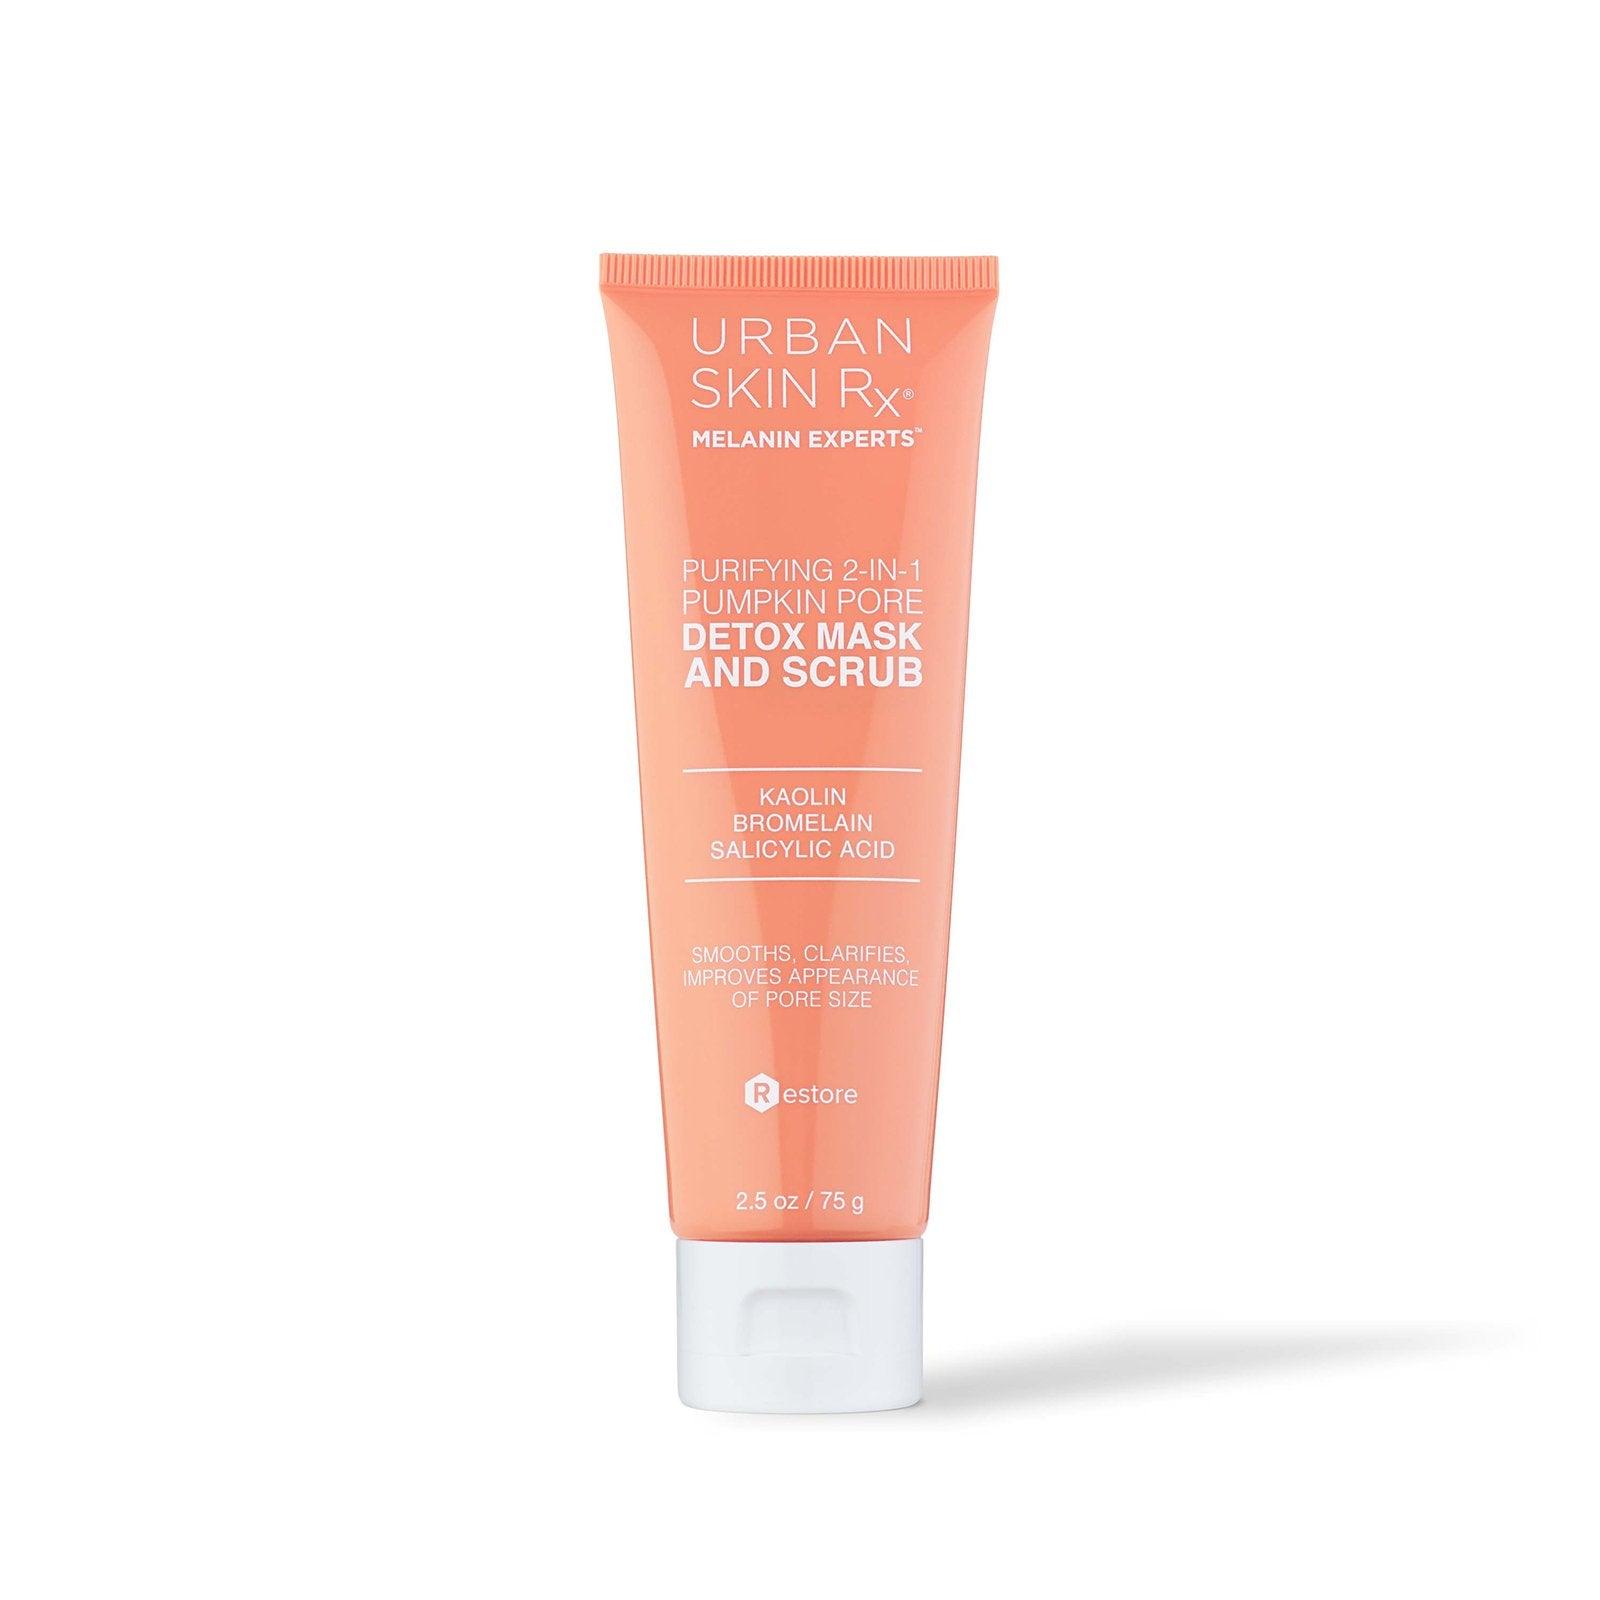 Urban Skin Rx - Purifying 2-in-1 Pumpkin Pore Detox Mask & Scrub